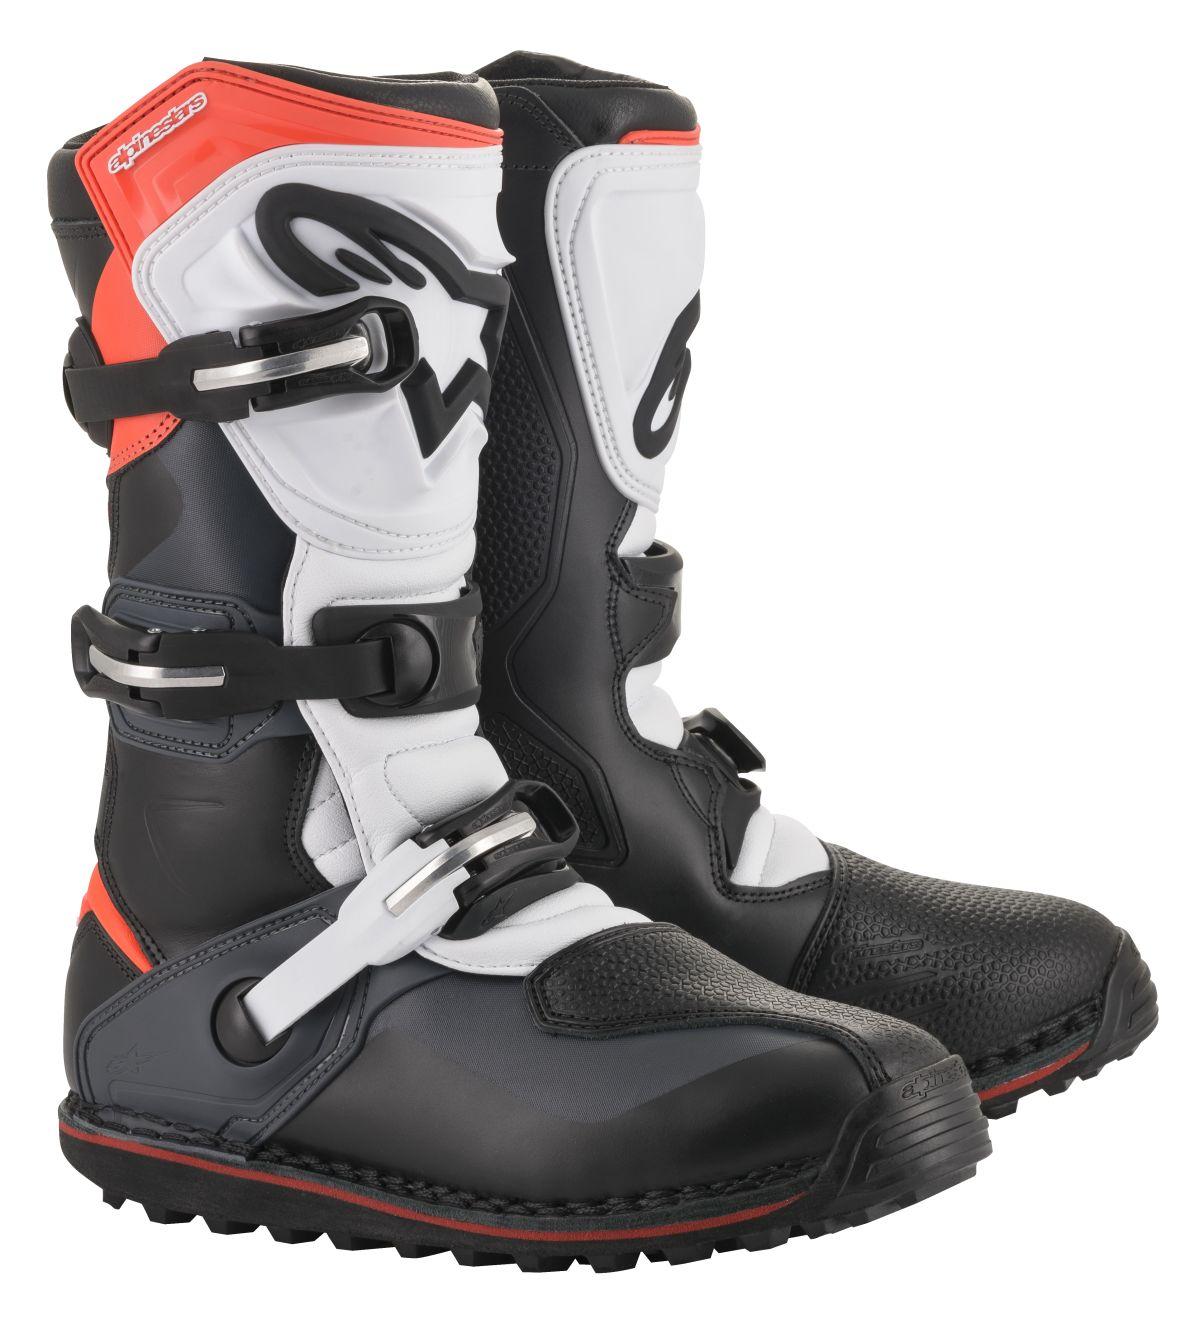 Alpinestars Enduro Laarzen TECH-T BK/GY/RD 11